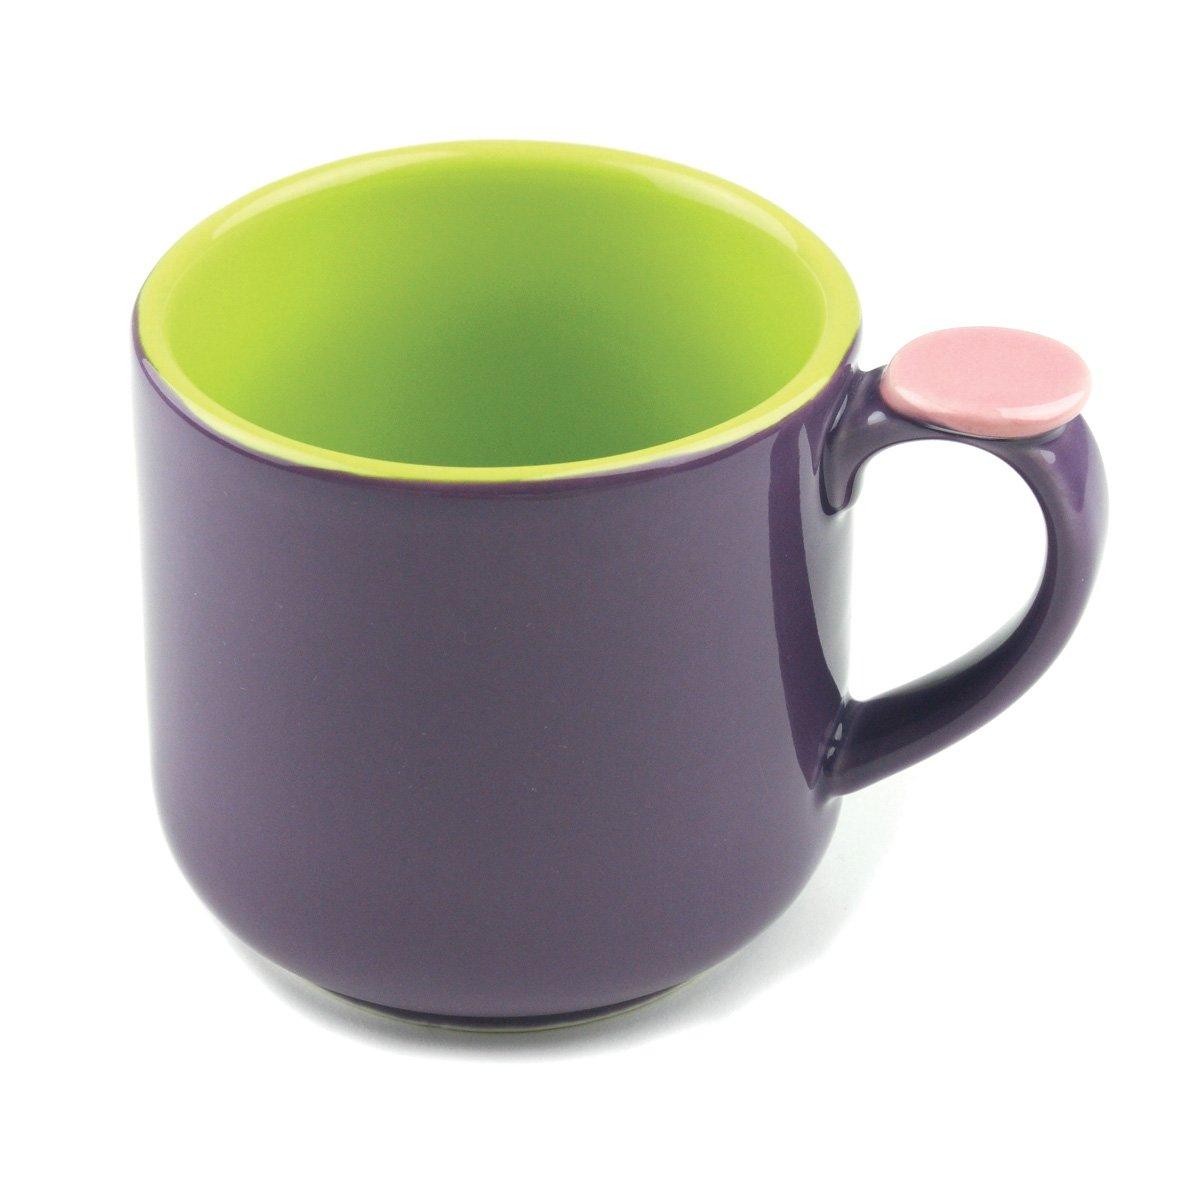 Purple//Green Omniware 1100467 Hemisphere Mug with Thumb Rest